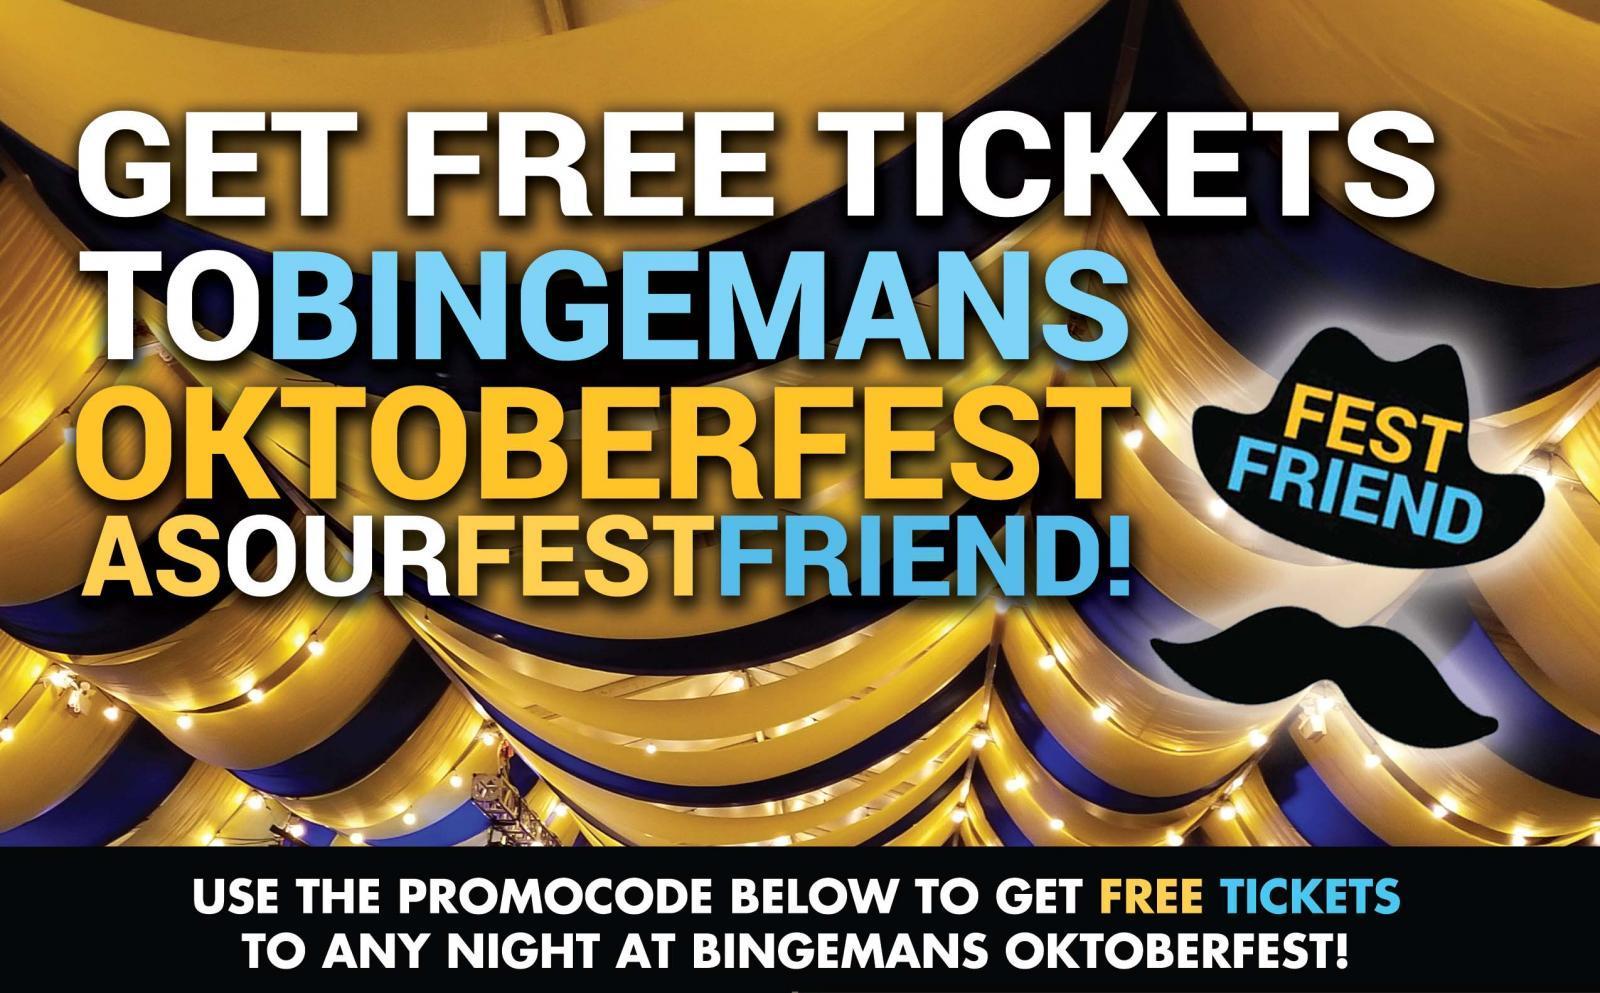 Get Free Tickets to Oktoberfest